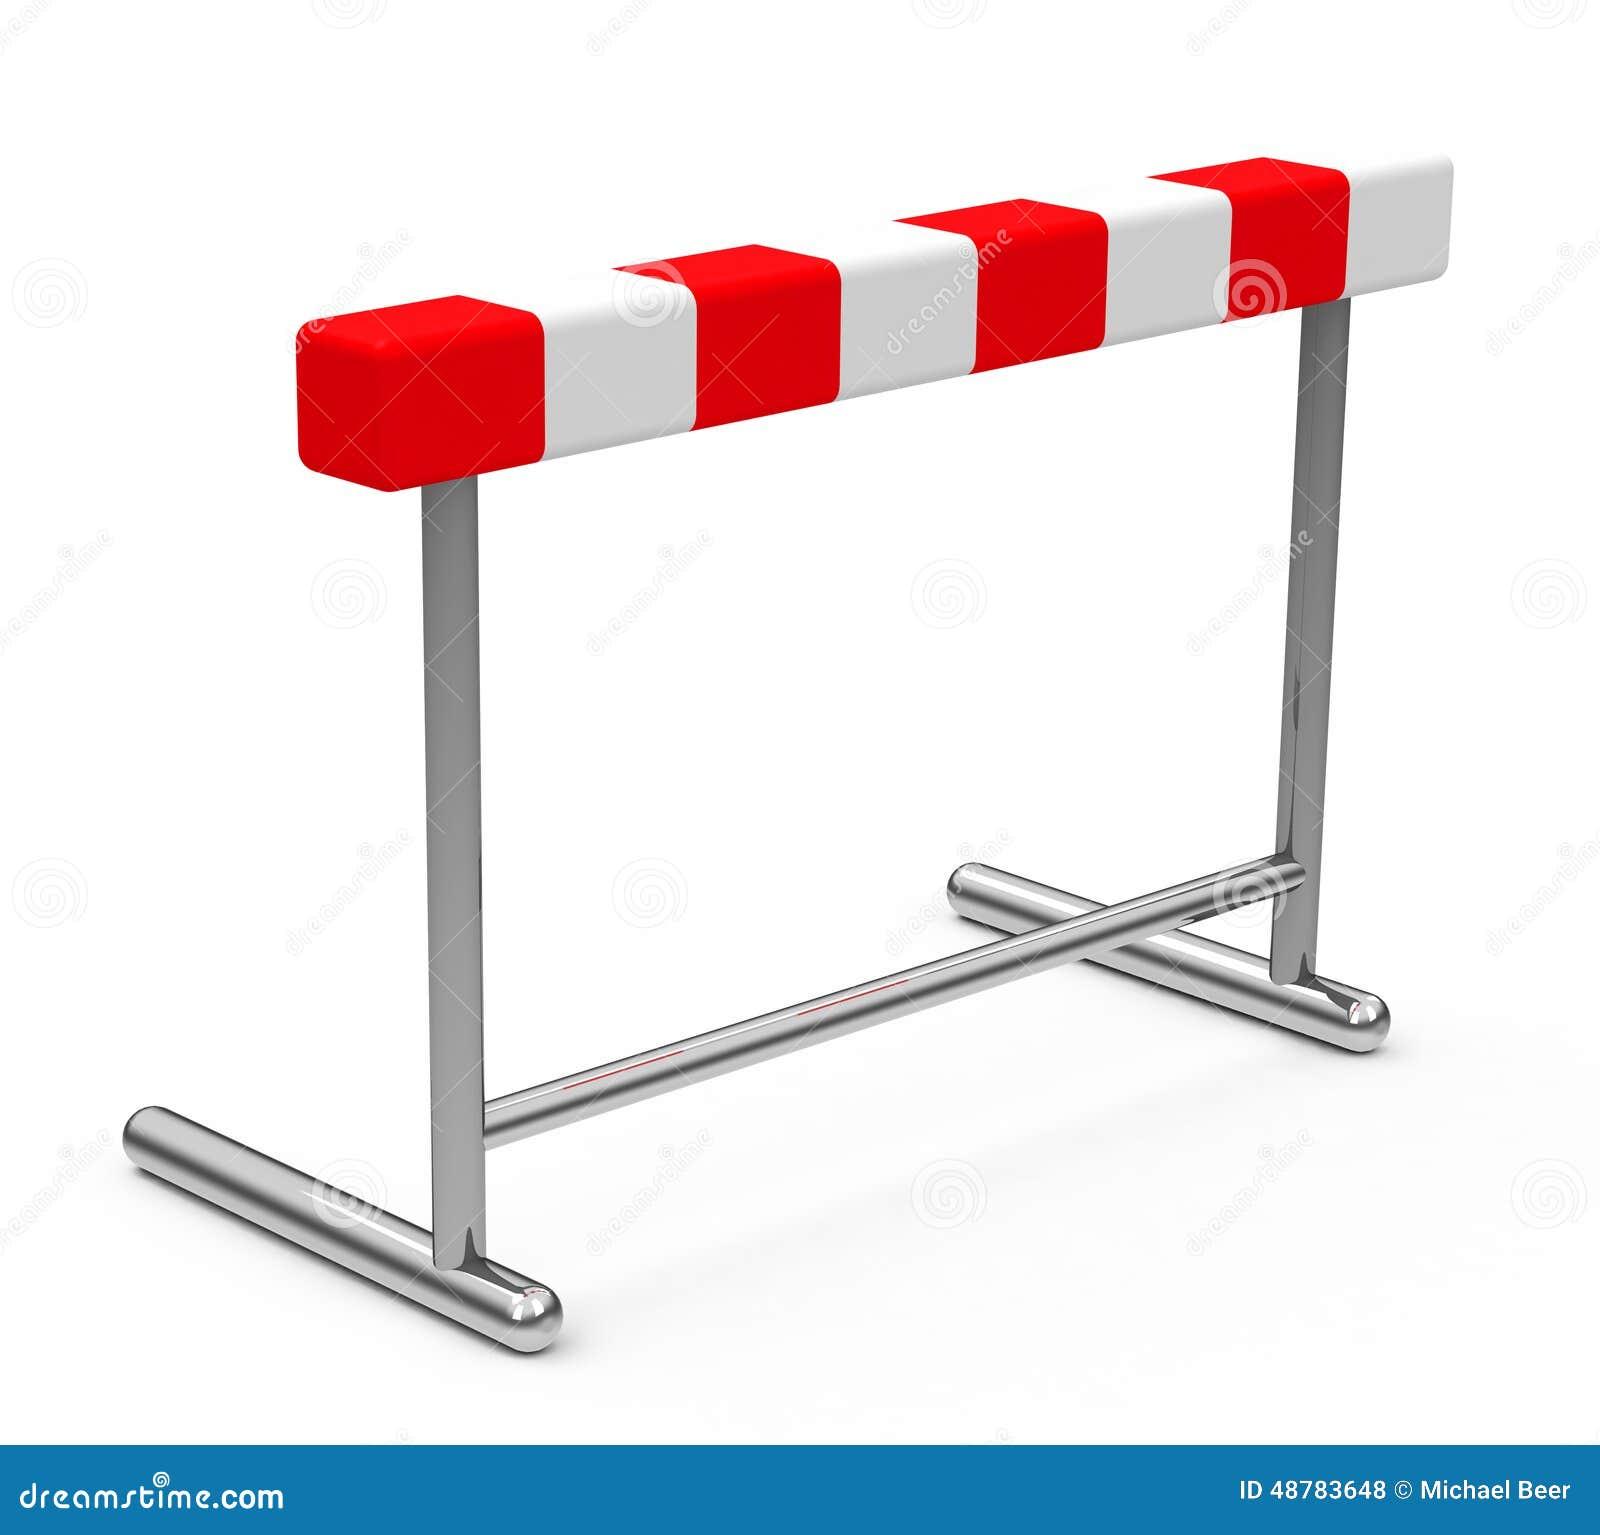 die h u00fcrde stock abbildung illustration von  u00fcbung  h u00fcrden hurdle clipart free clipart hurdle pictures